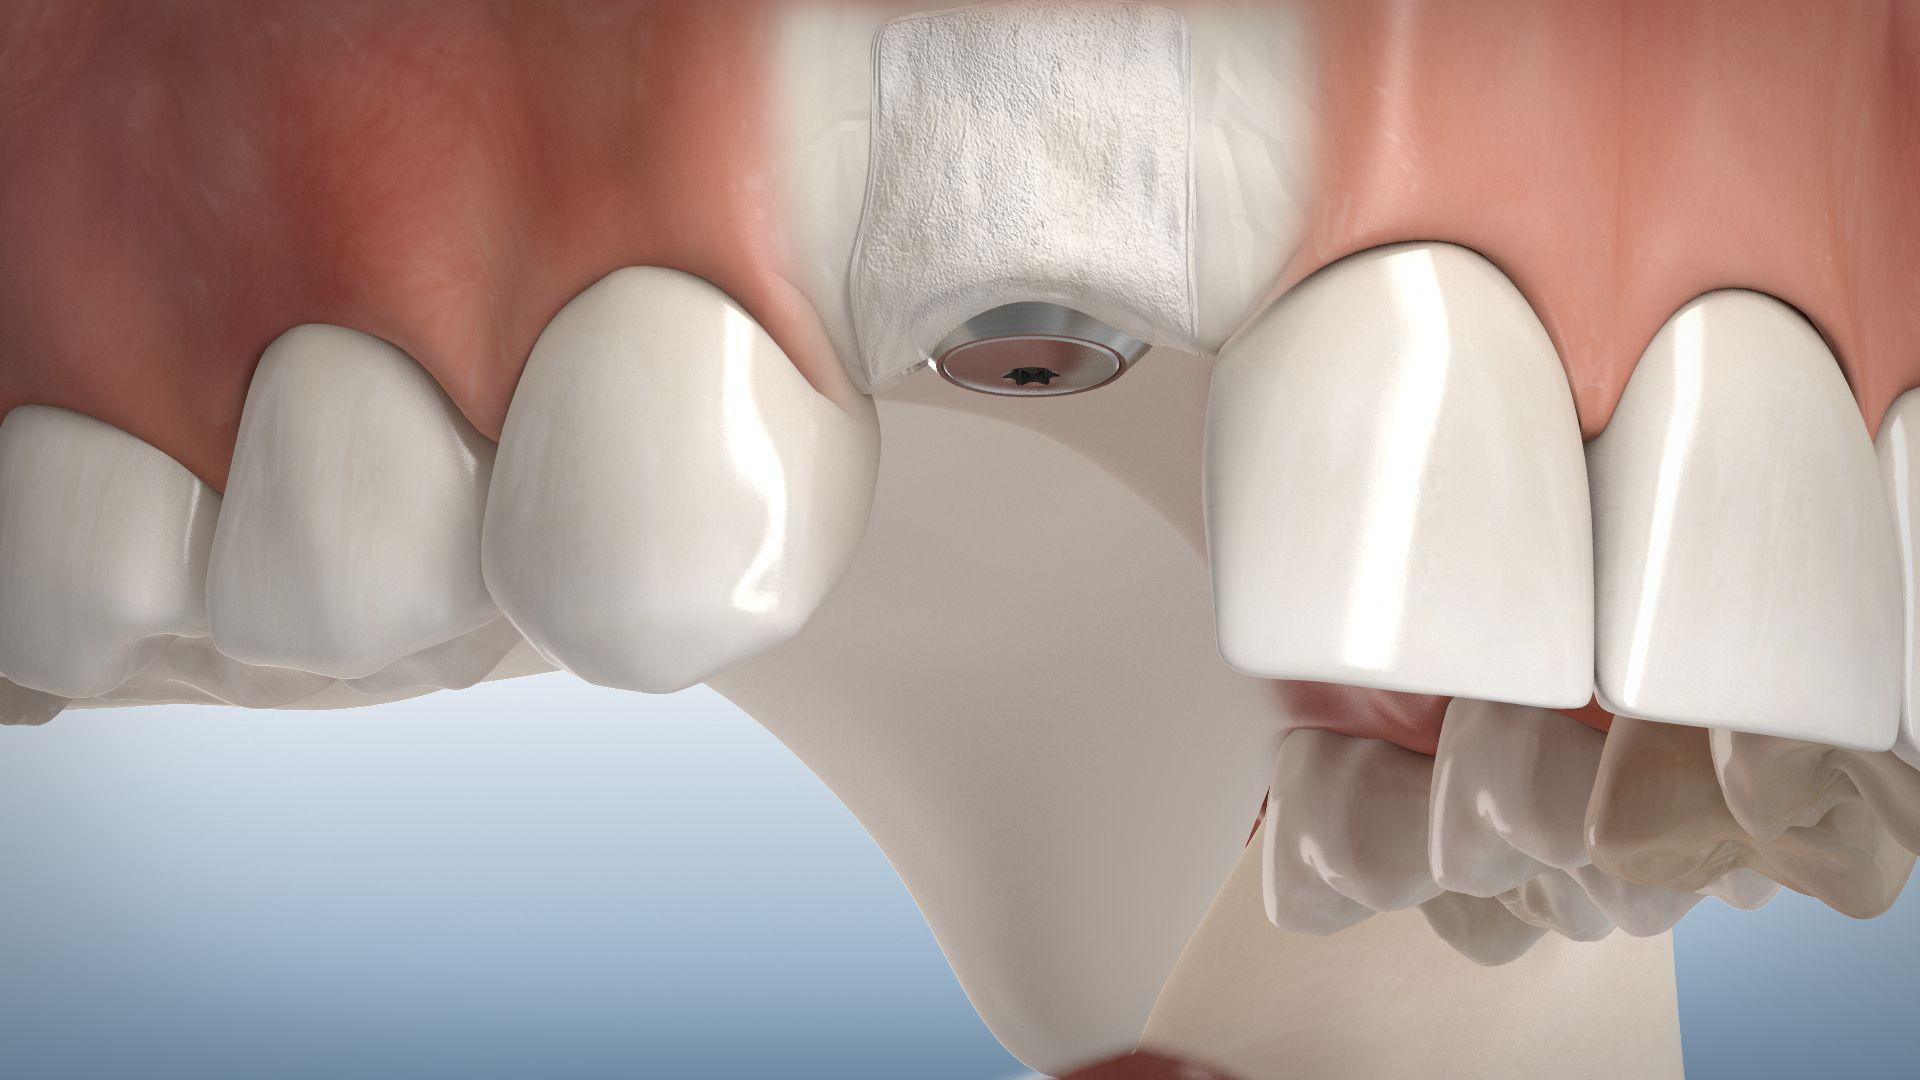 Knochenaufbau um Implantate